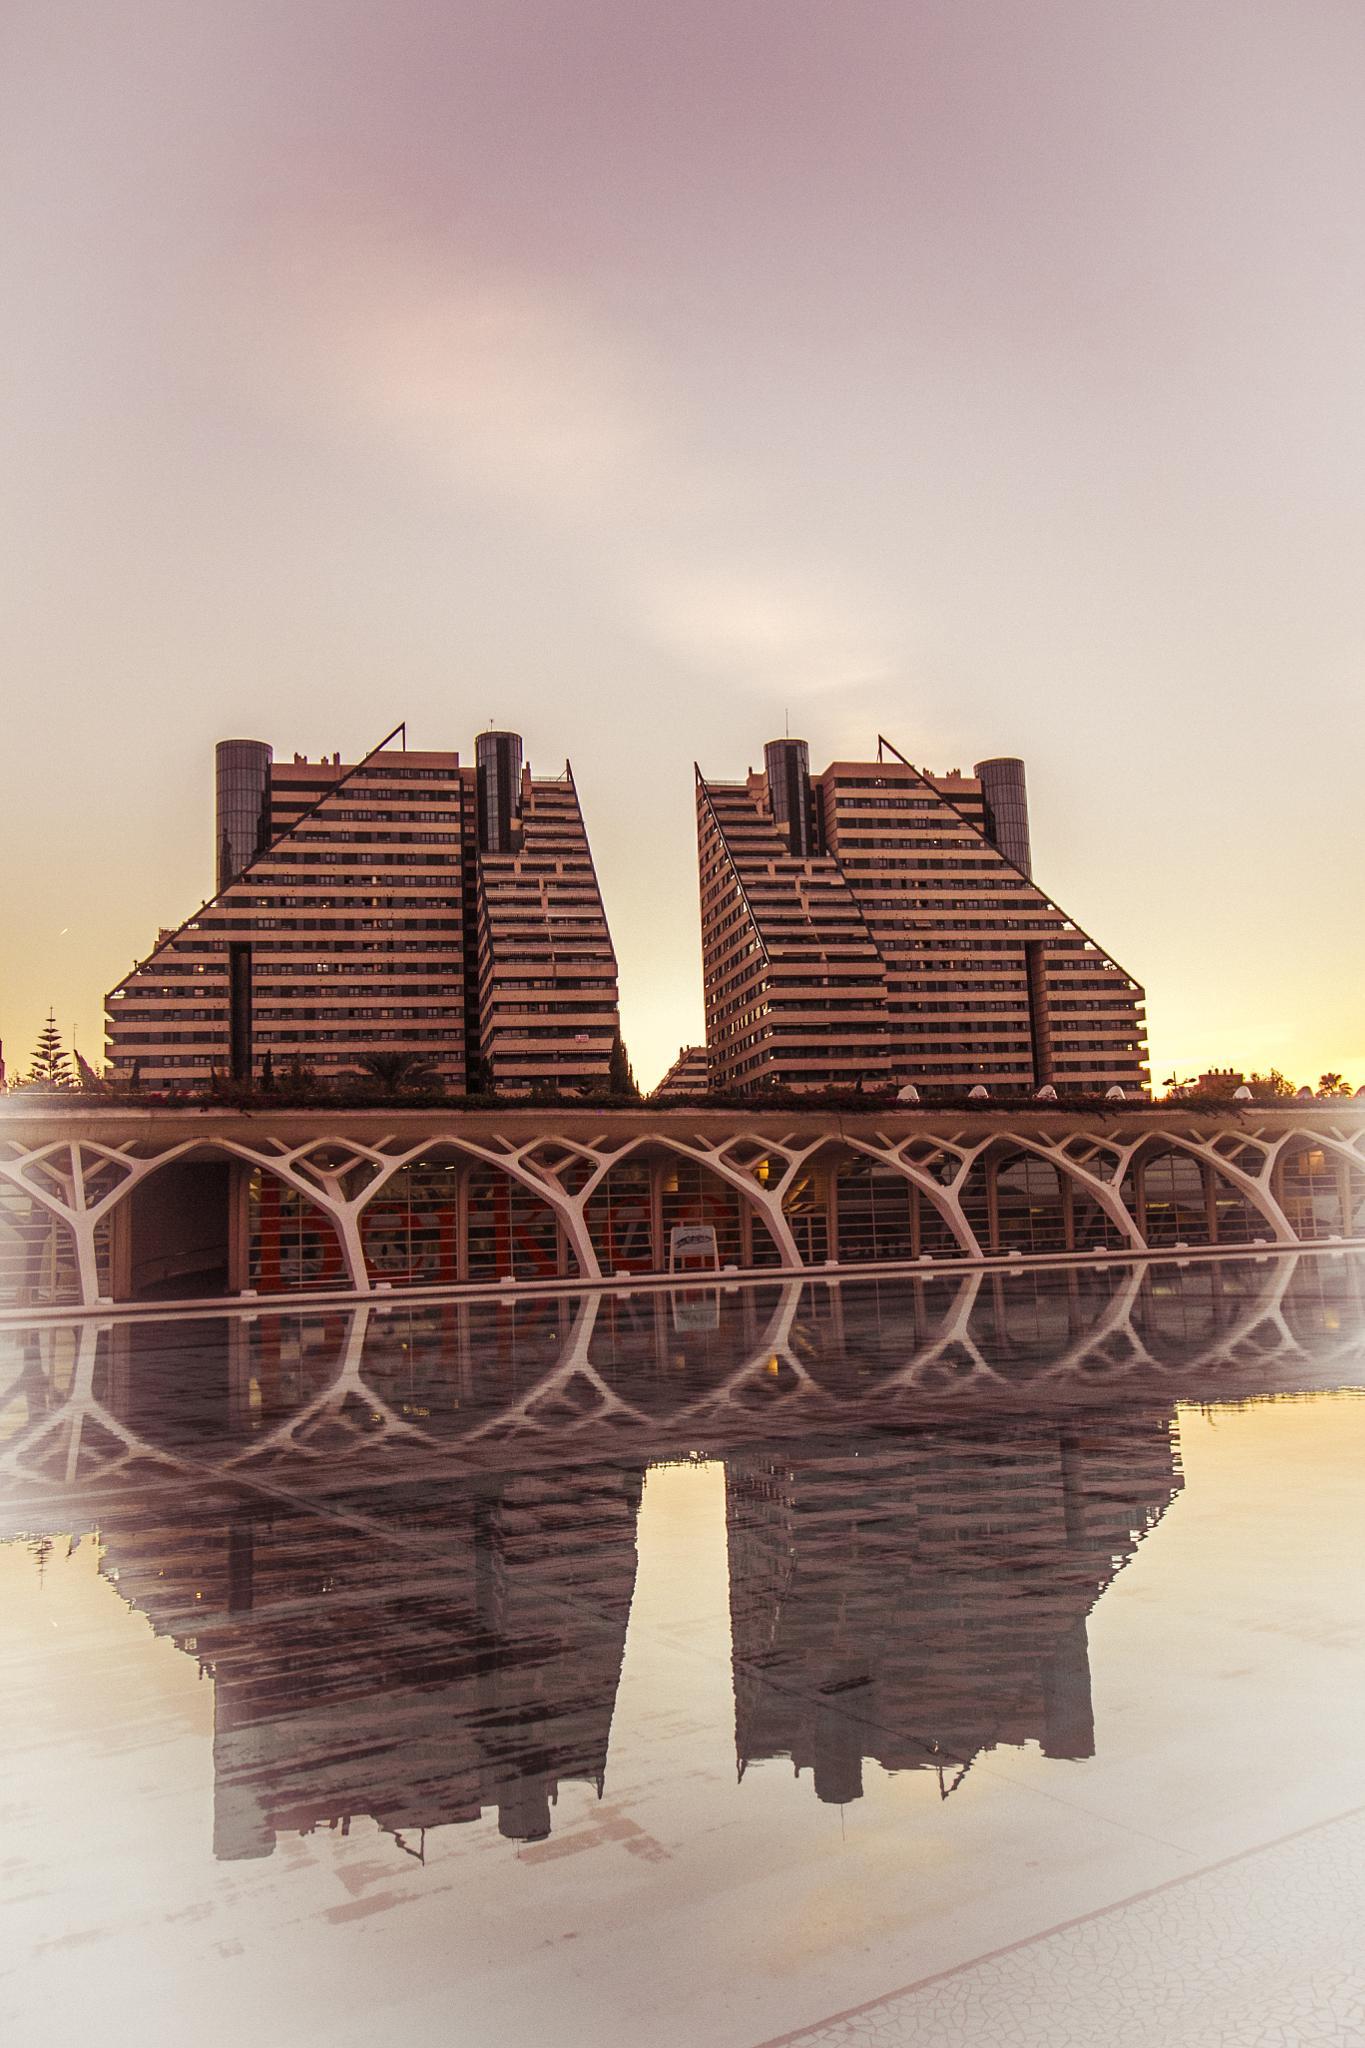 arquitecturas by carmenvich